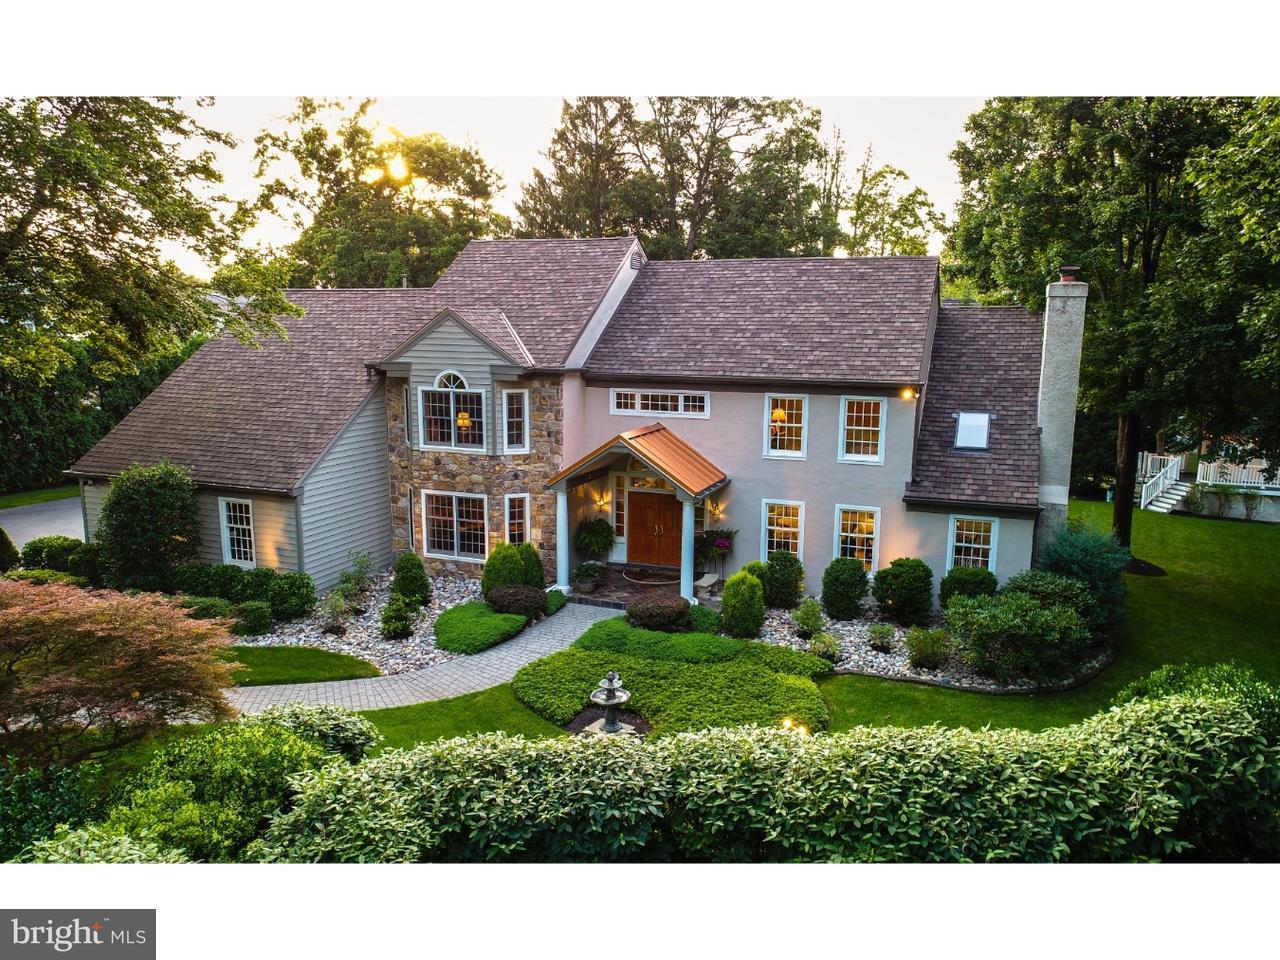 Single Family Home for Sale at 113 SUGARTOWN Road Devon, Pennsylvania 19333 United States